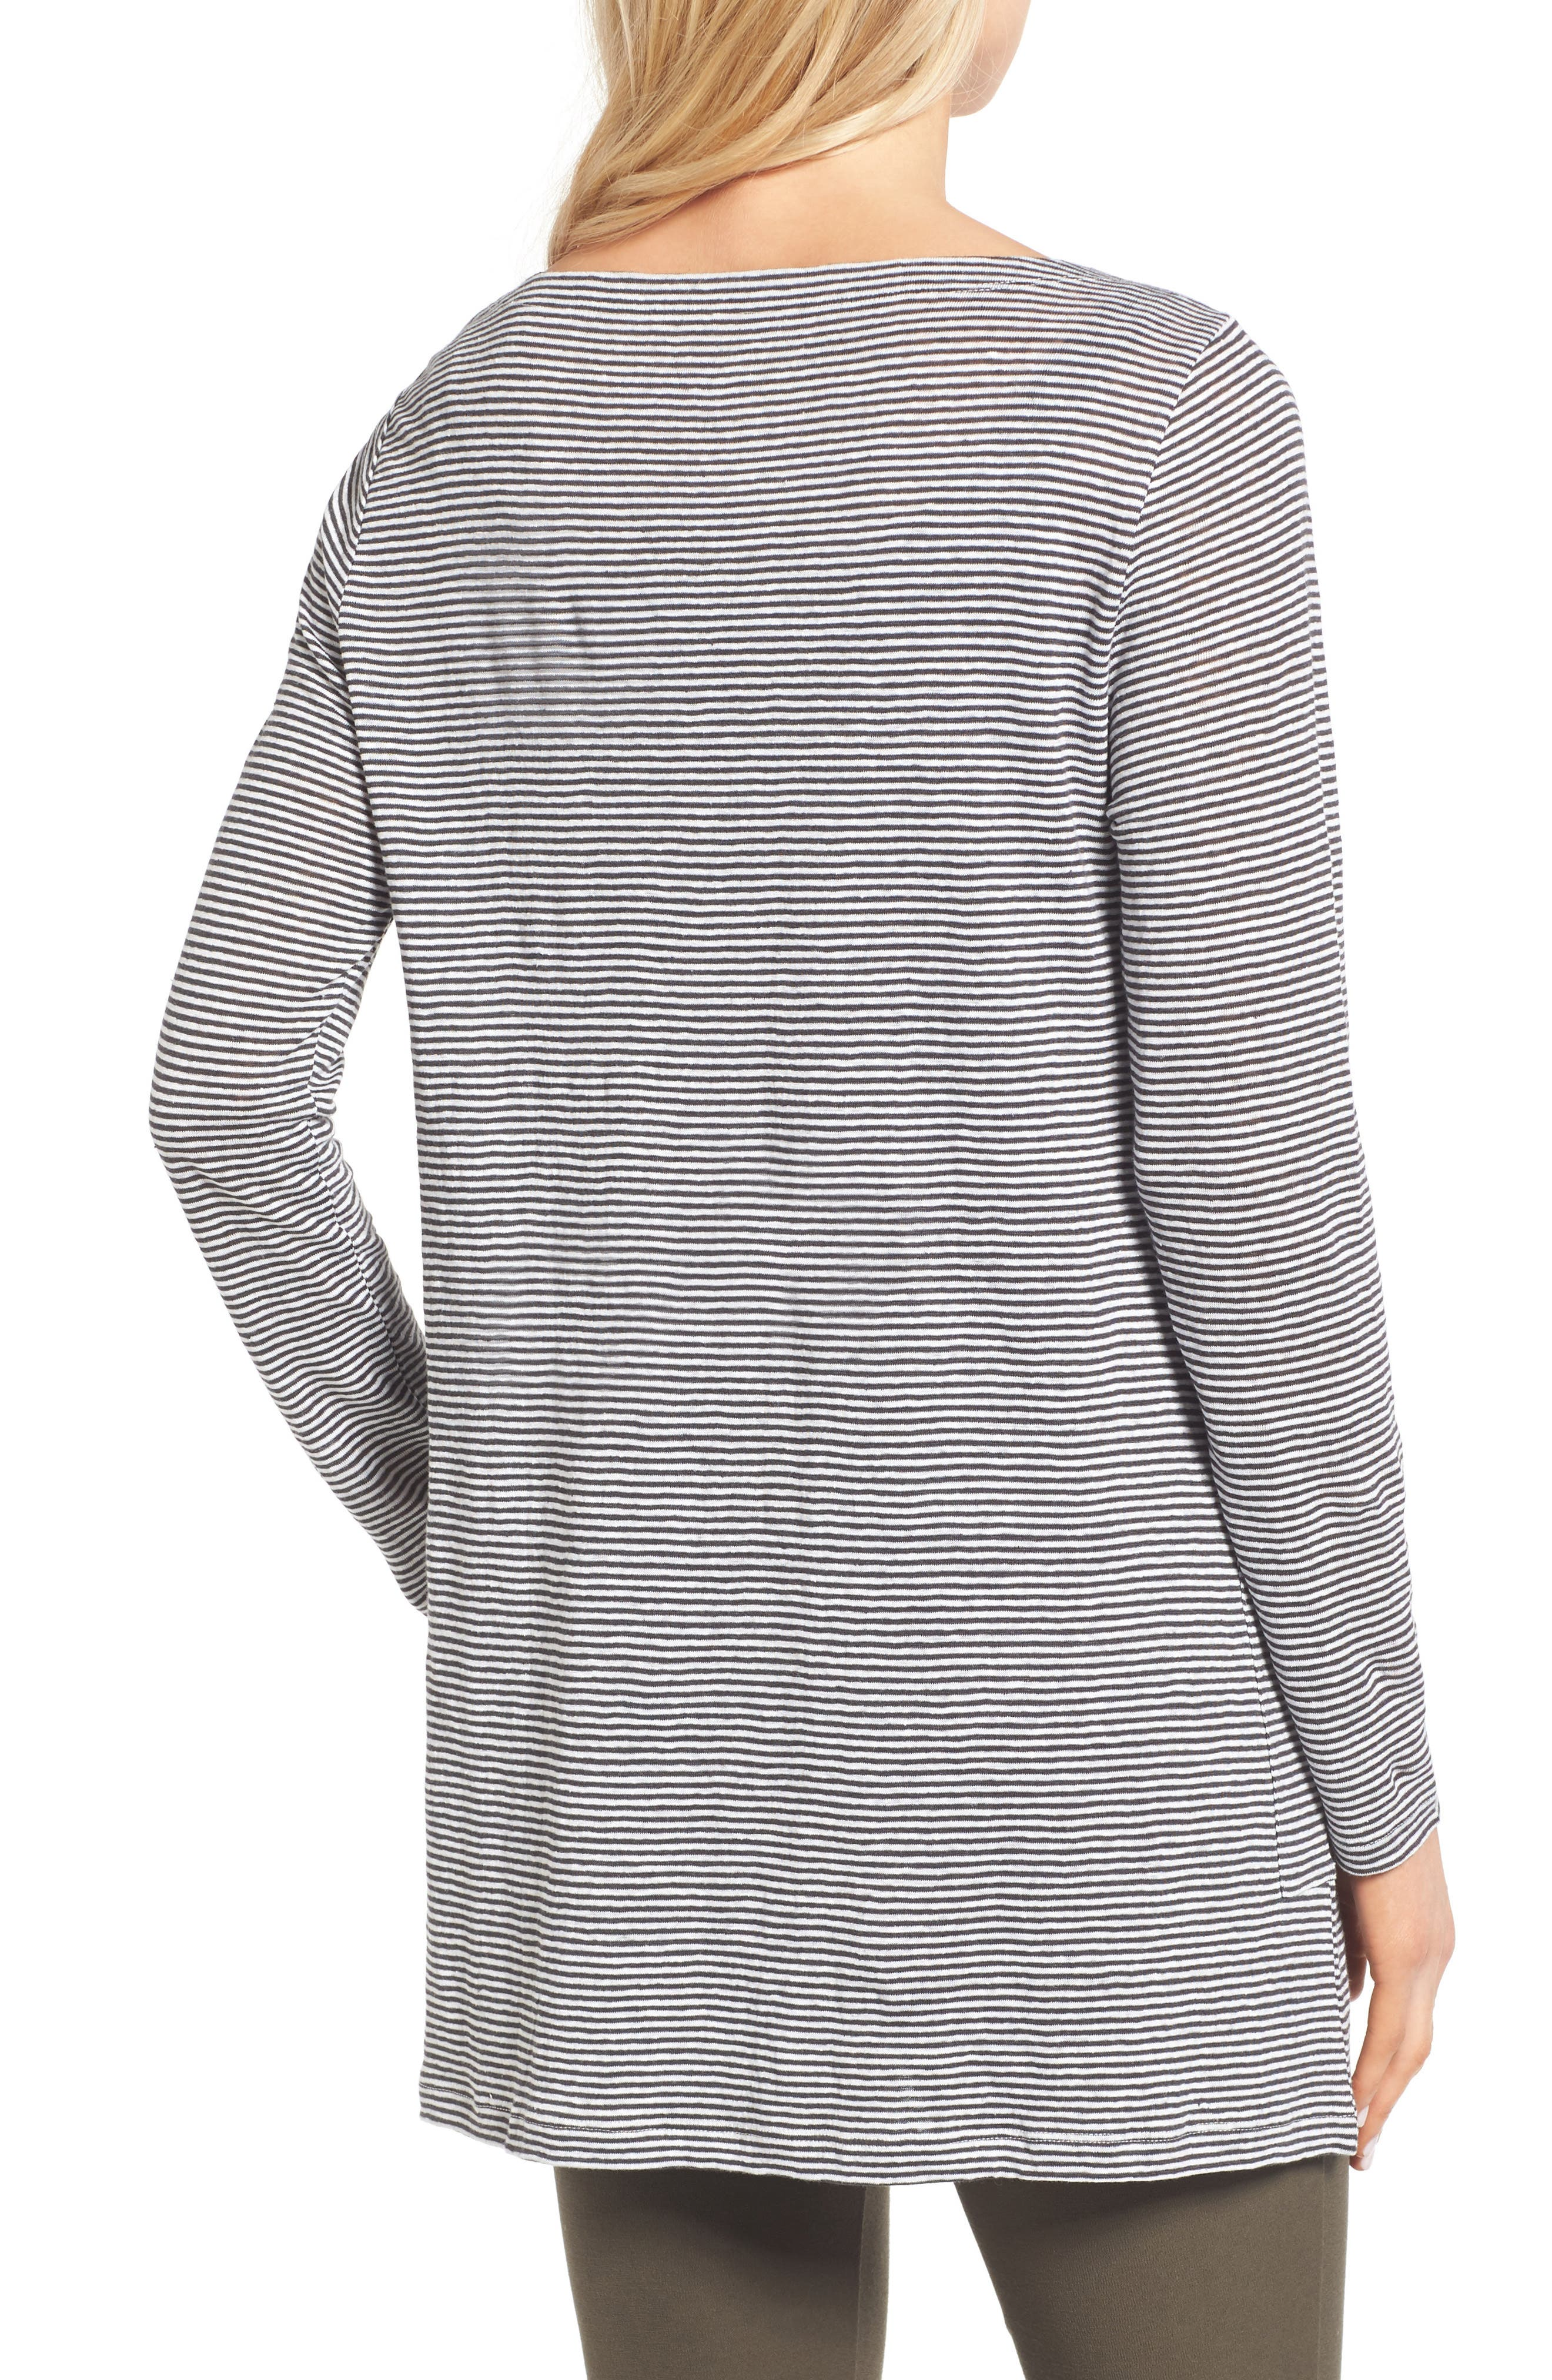 Alternate Image 2  - Eileen Fisher Organic Linen Knit Tunic